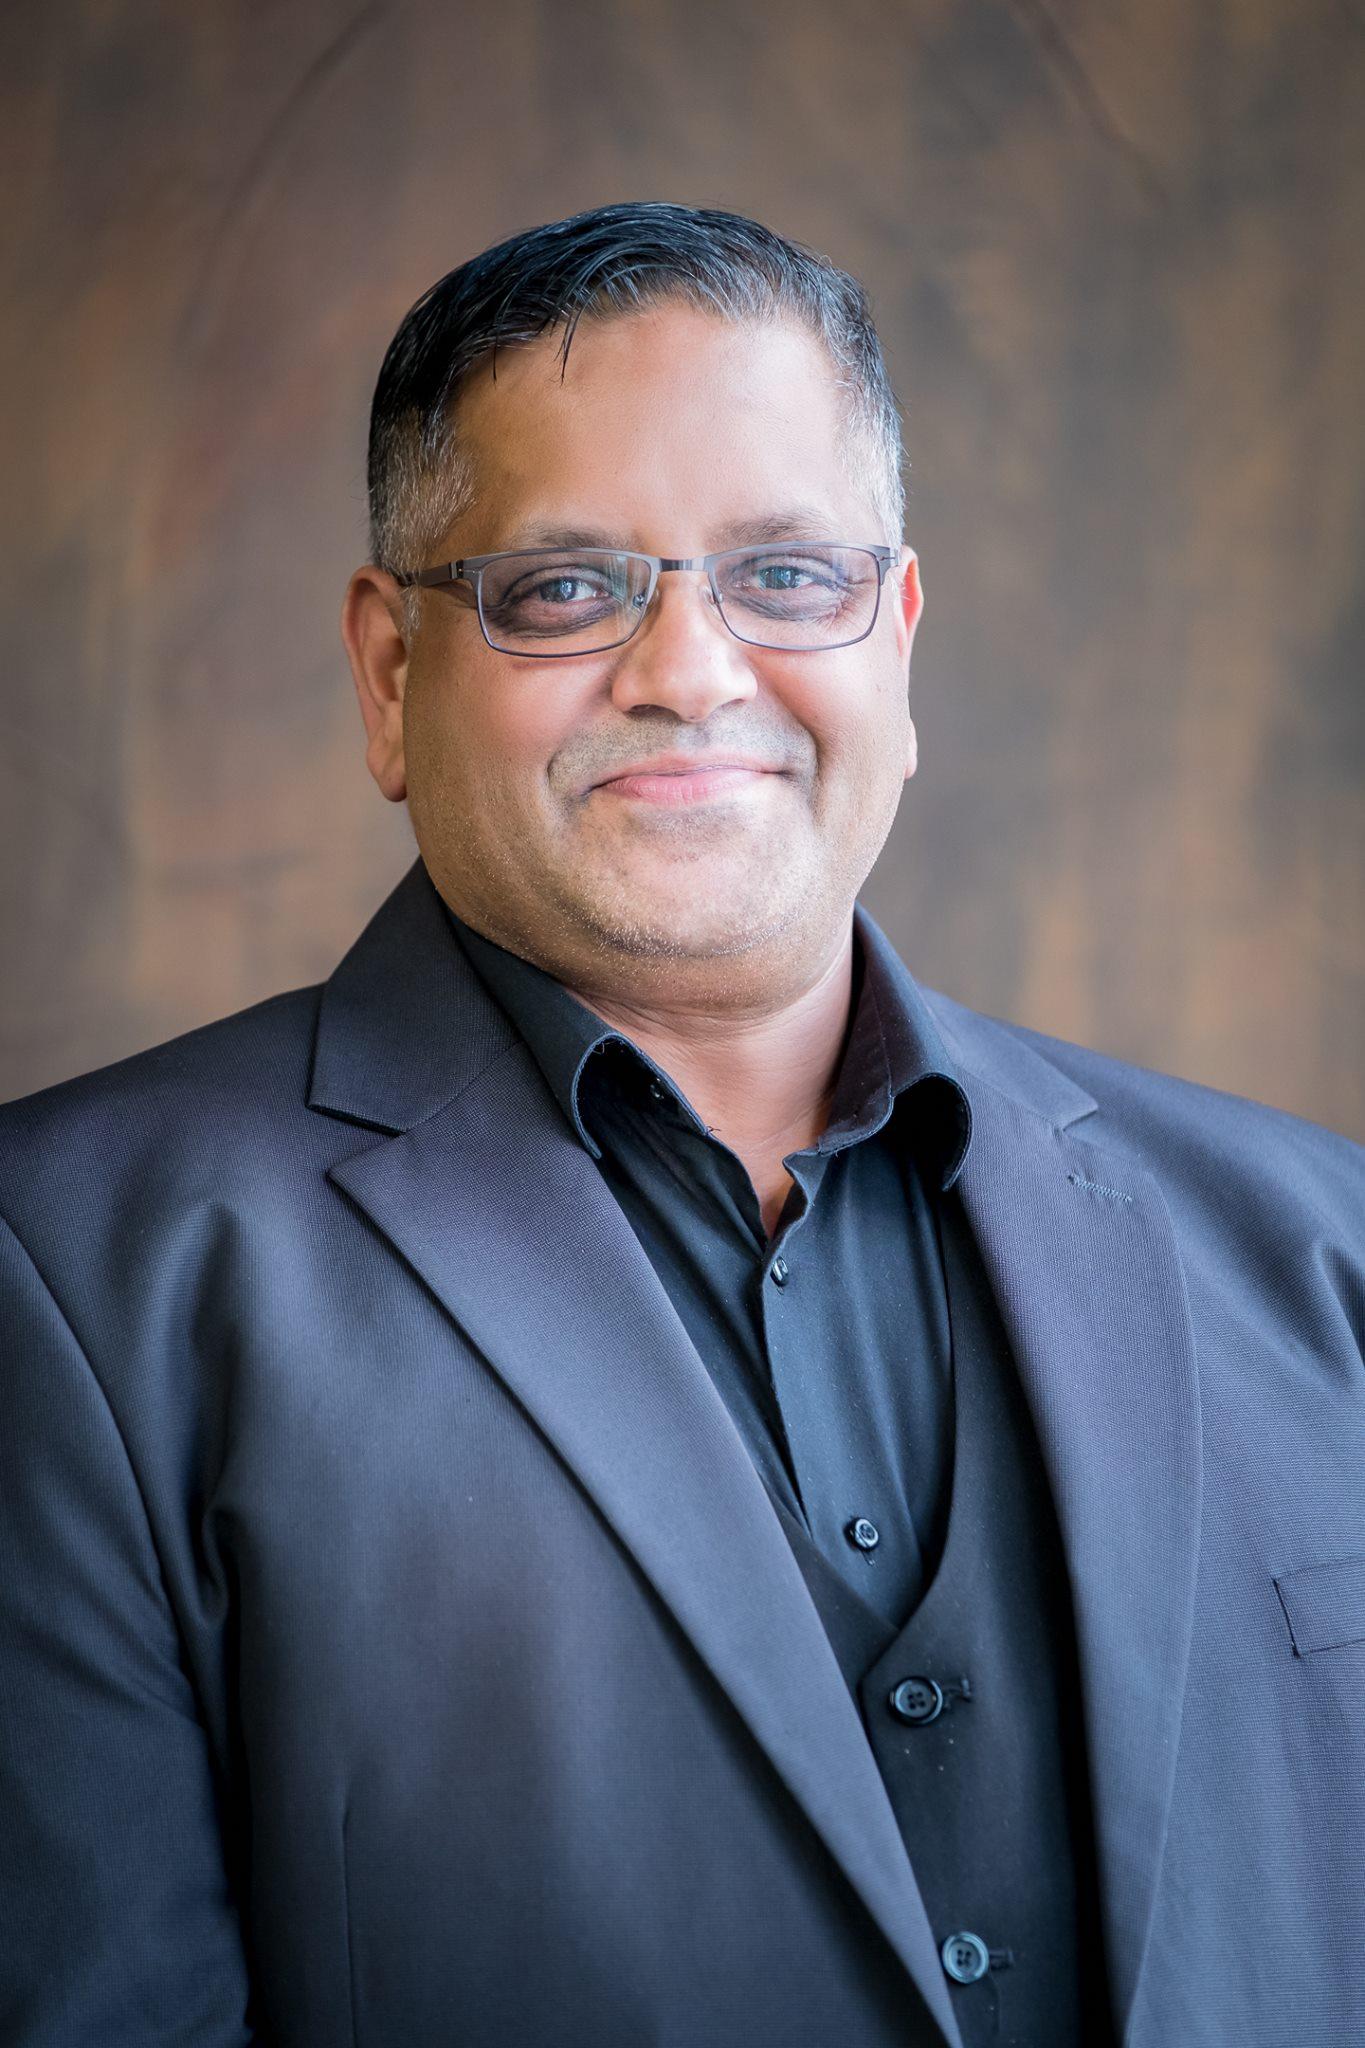 Rakesh_Patel_headshot_profile_colour.jpg